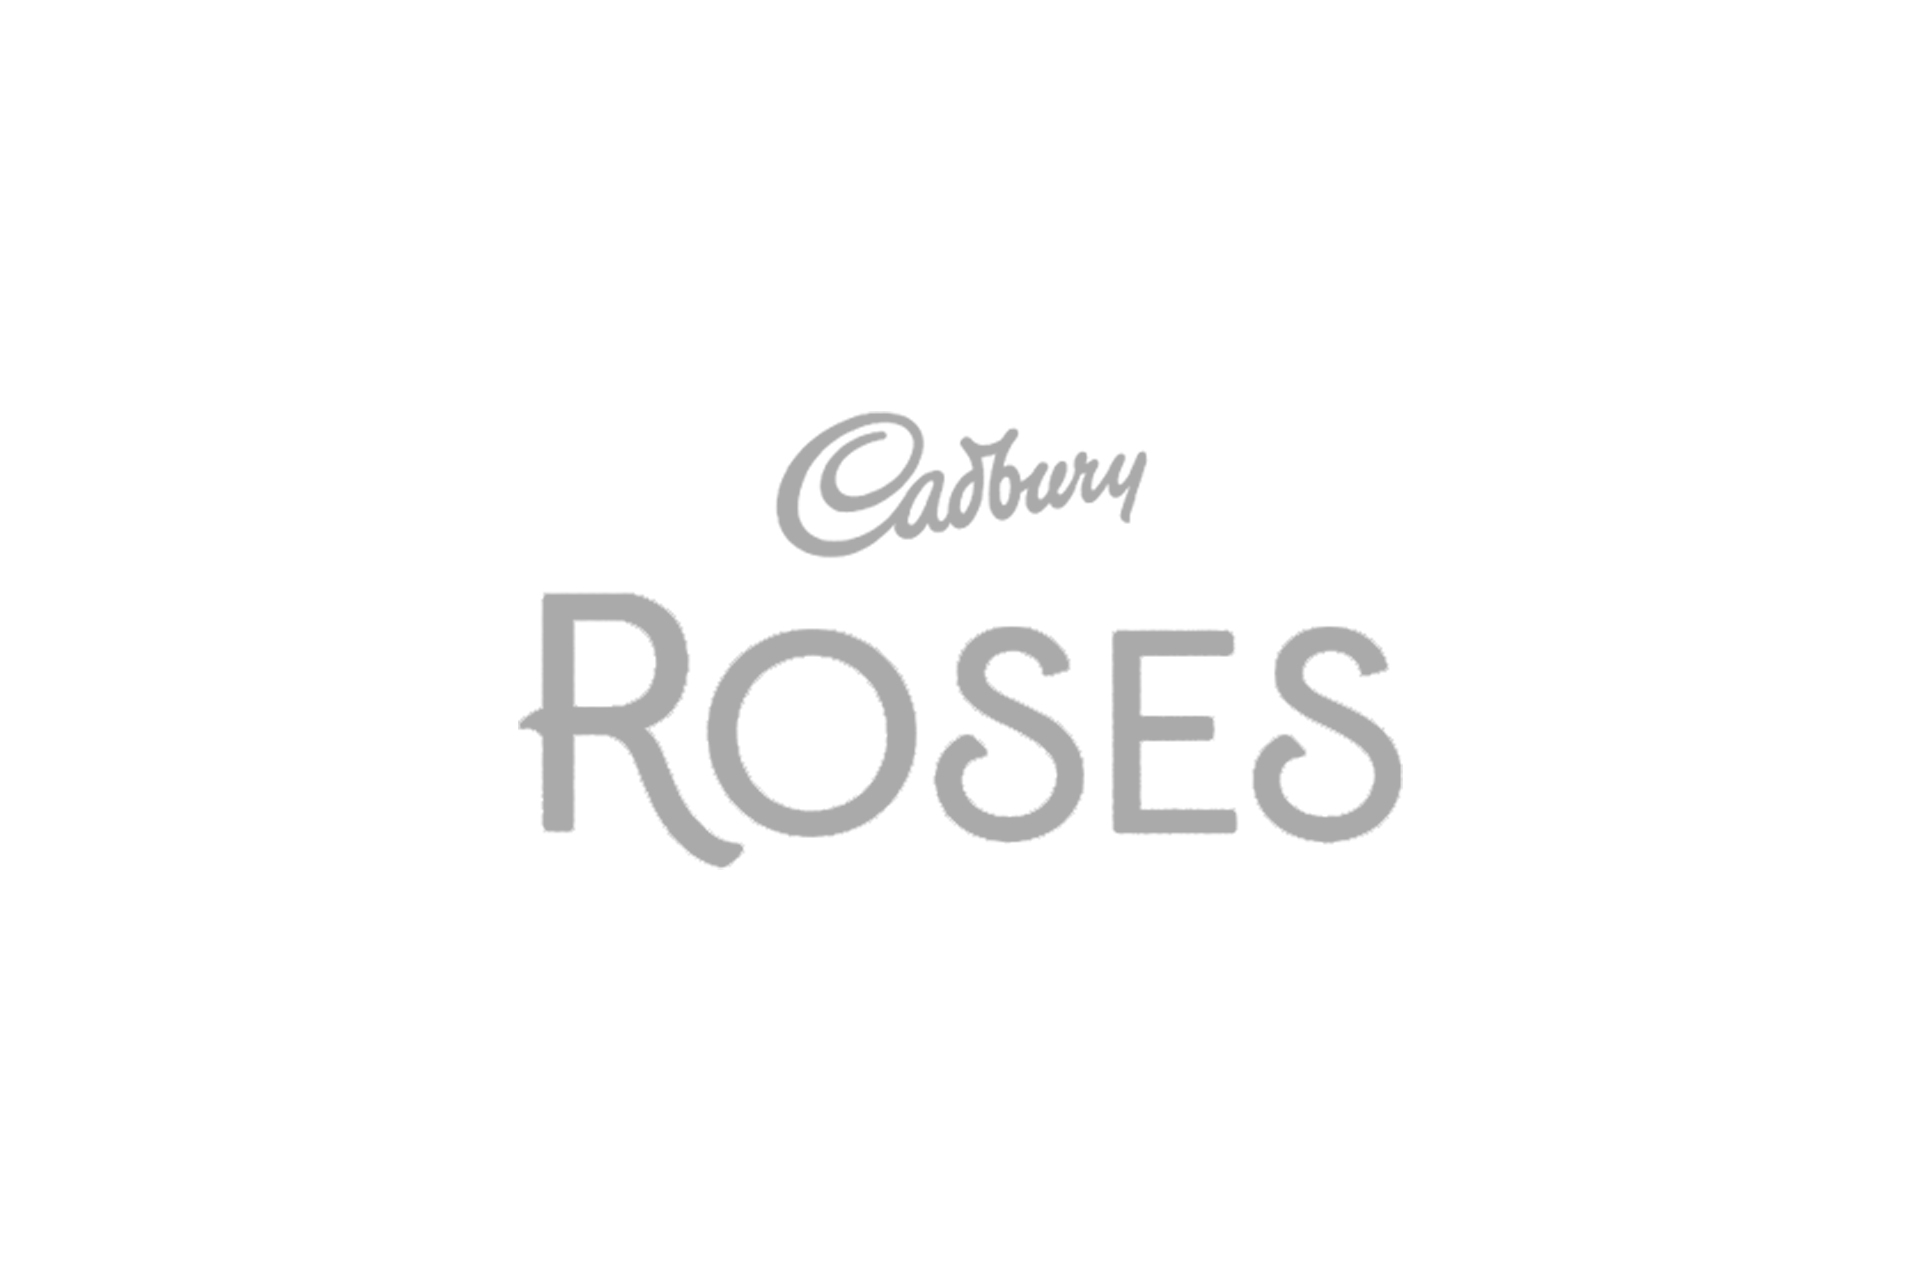 cadbury roses logo grey